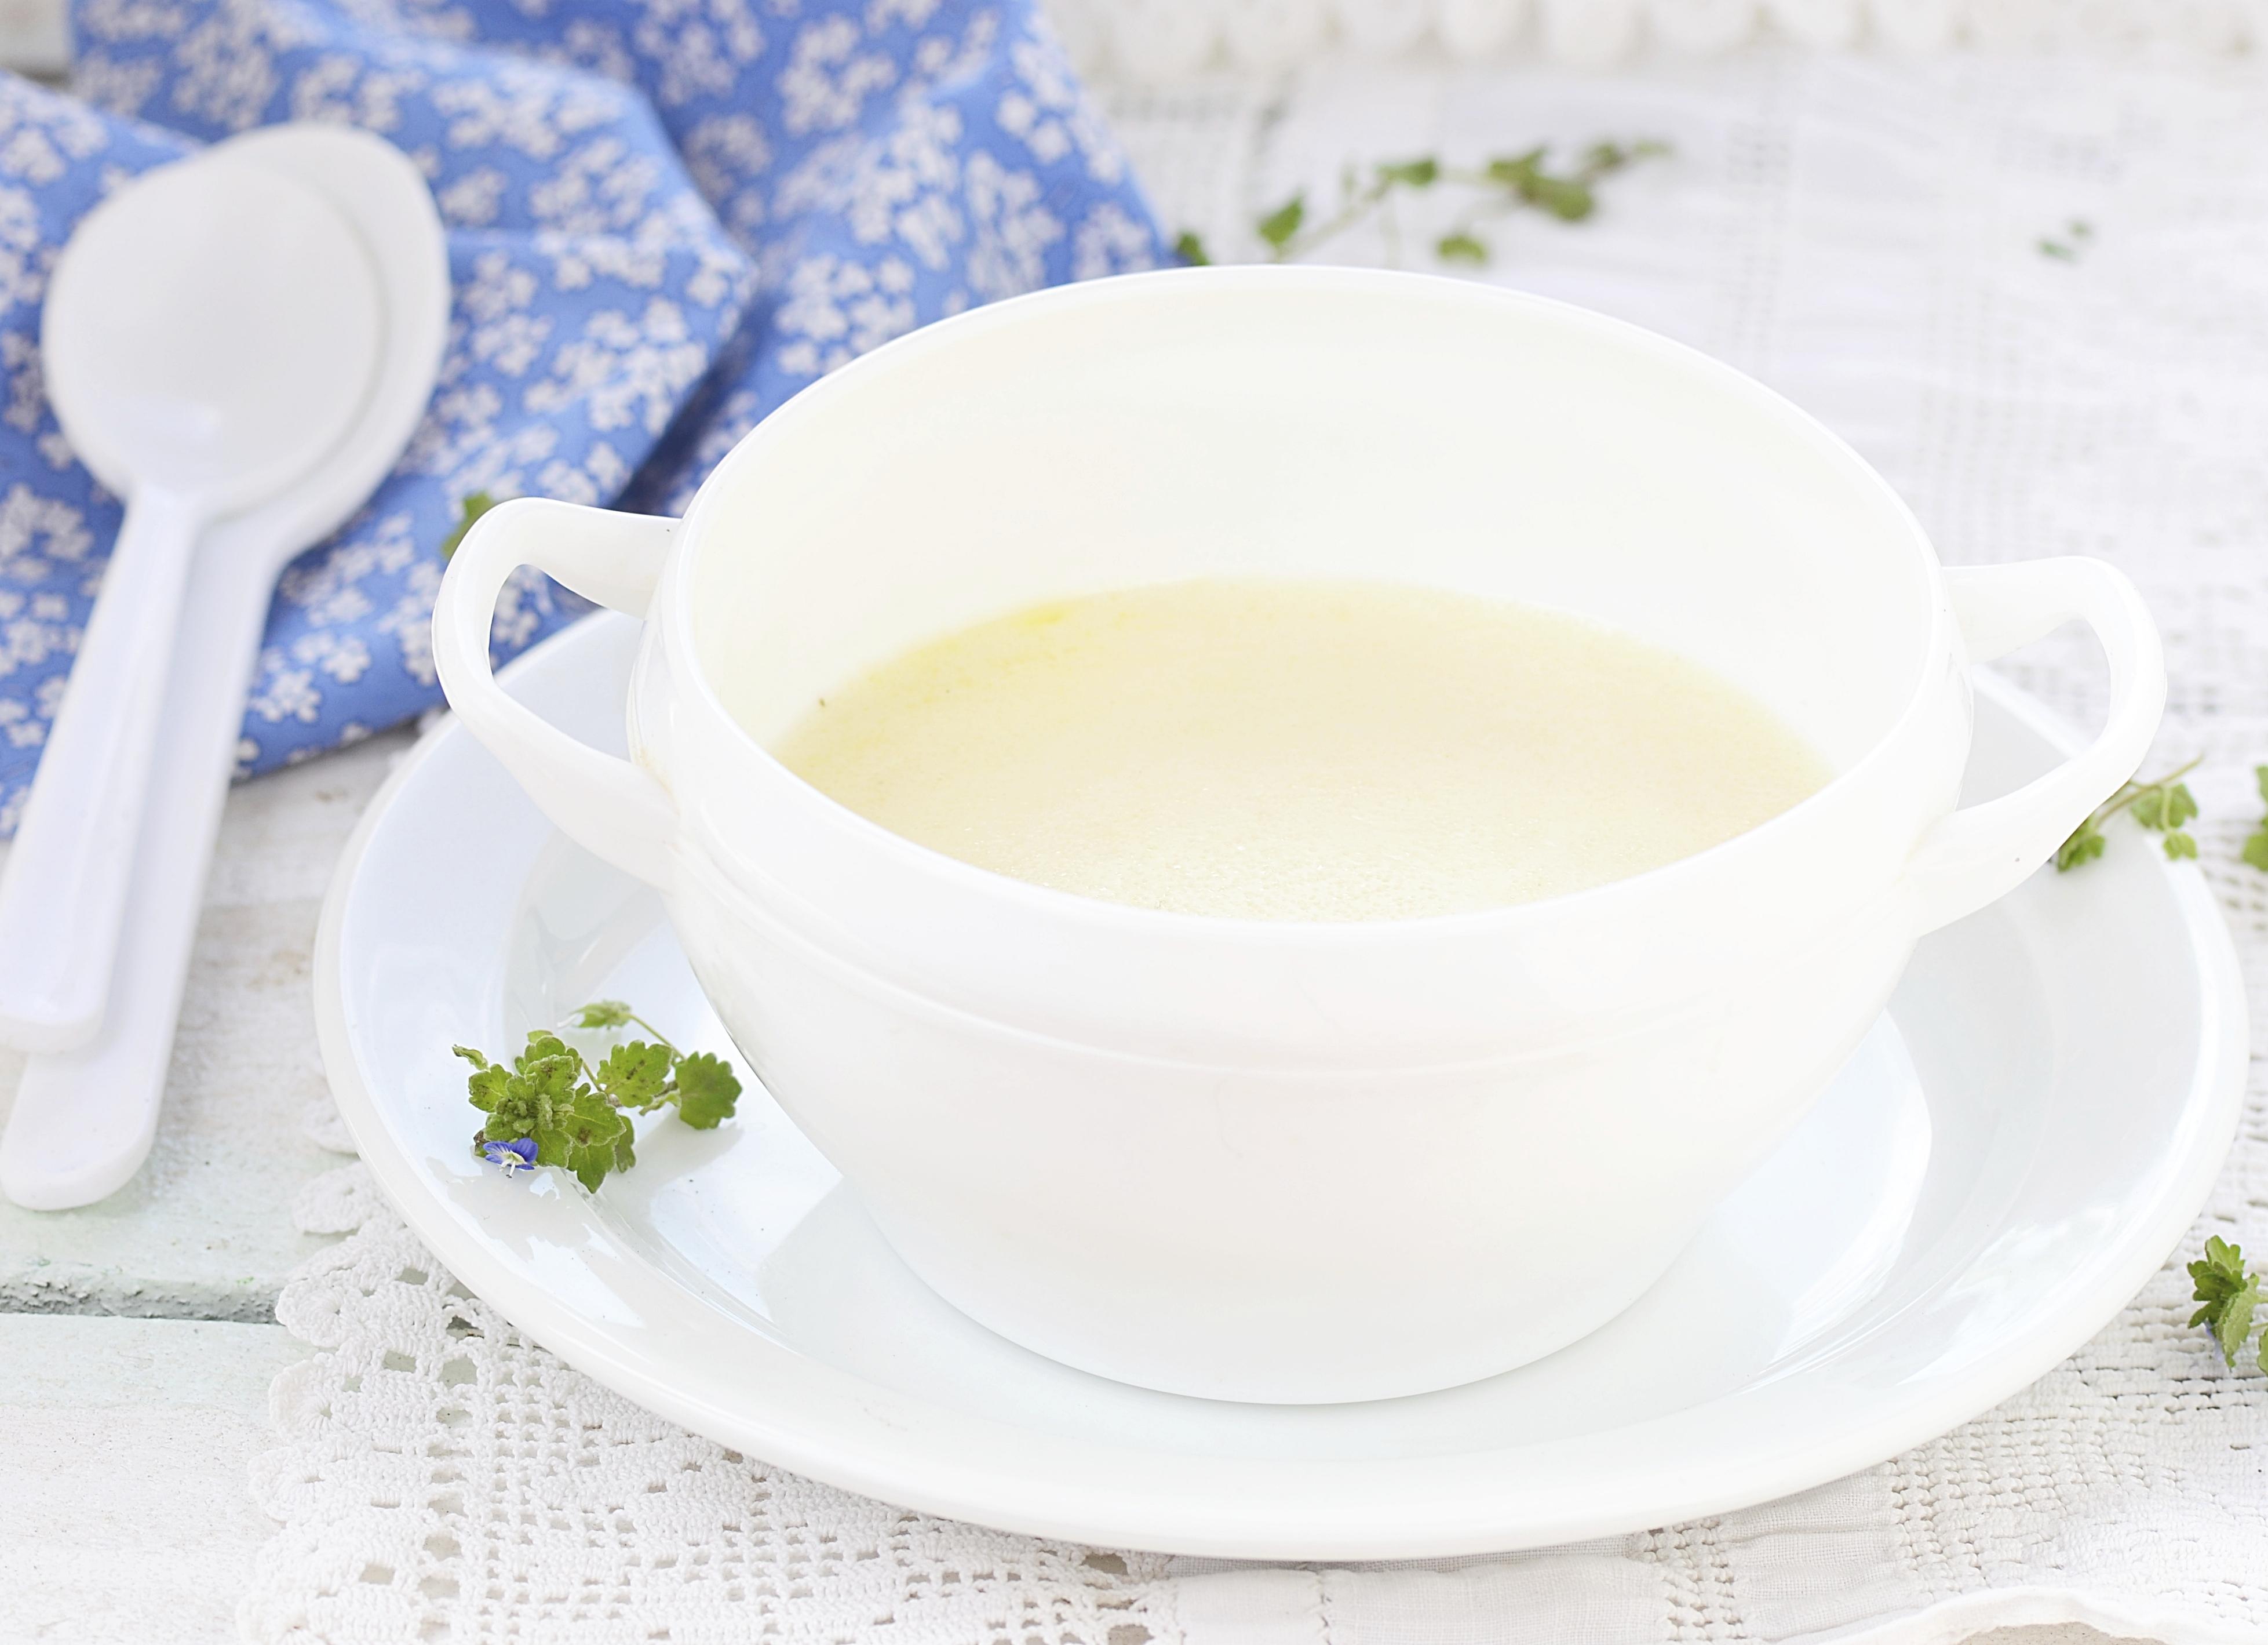 Sémola de arroz con leche